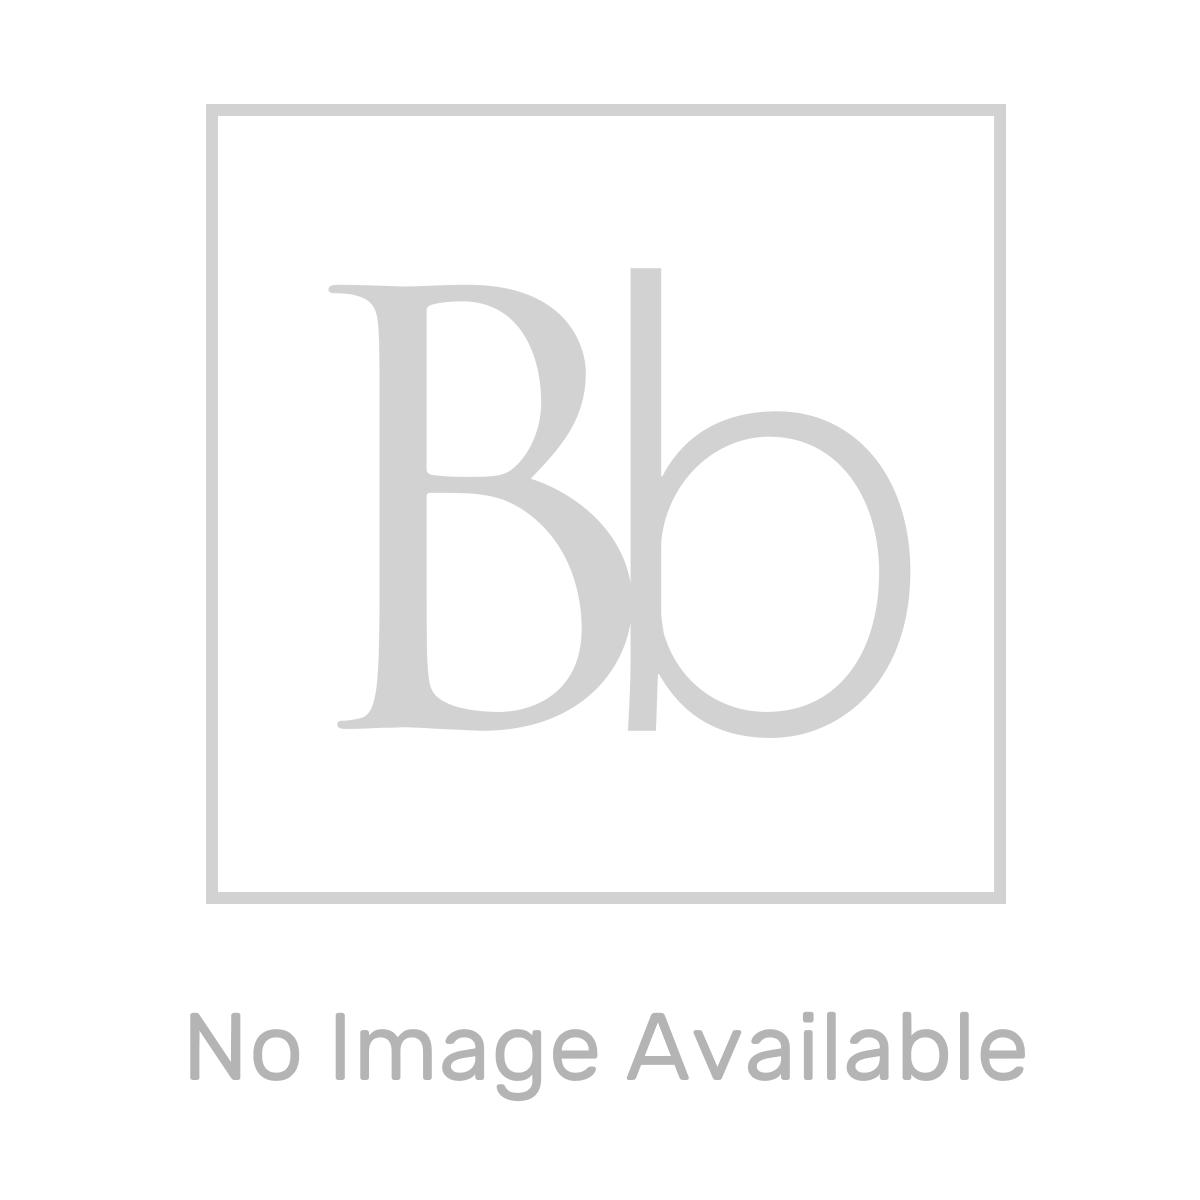 Prestige2 Frameless Hinged Shower Door with Optional Side Panel Detail 3